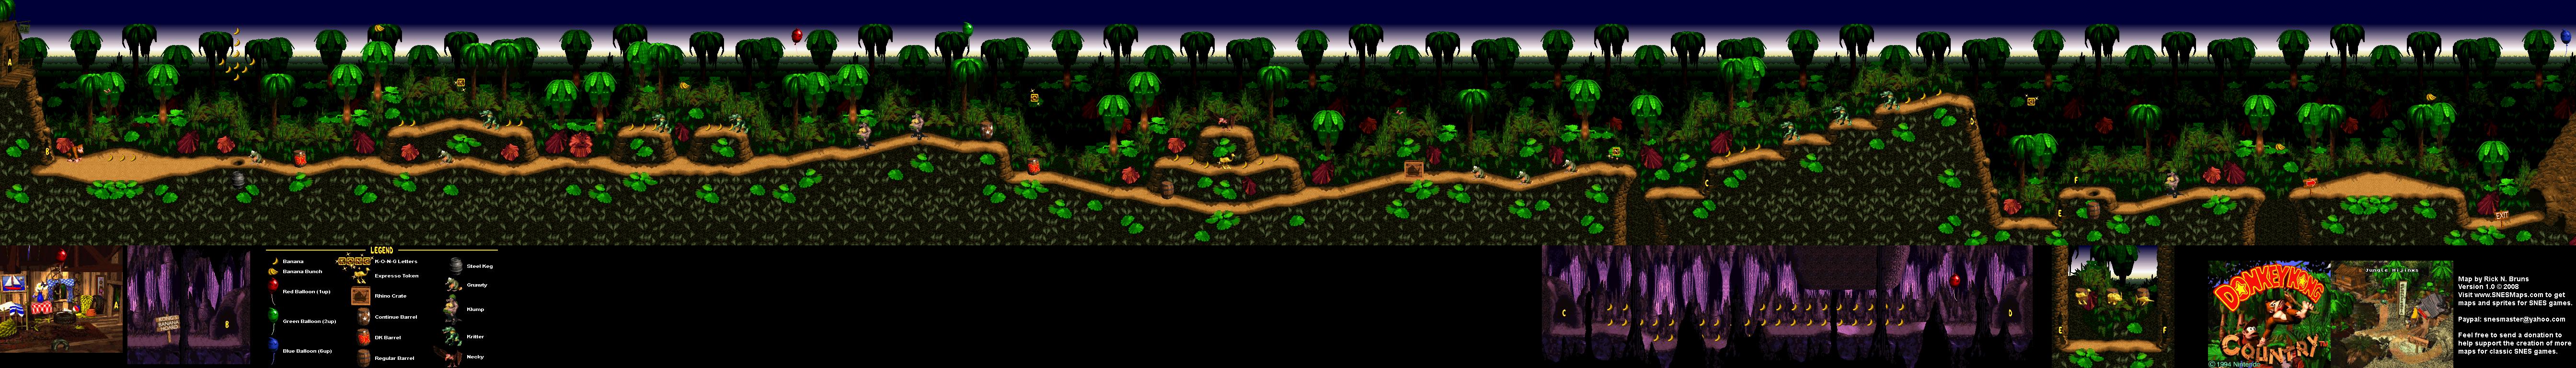 Donkey Kong Country - Level 1 - Jungle Hijinxs - Super Nintendo SNES on